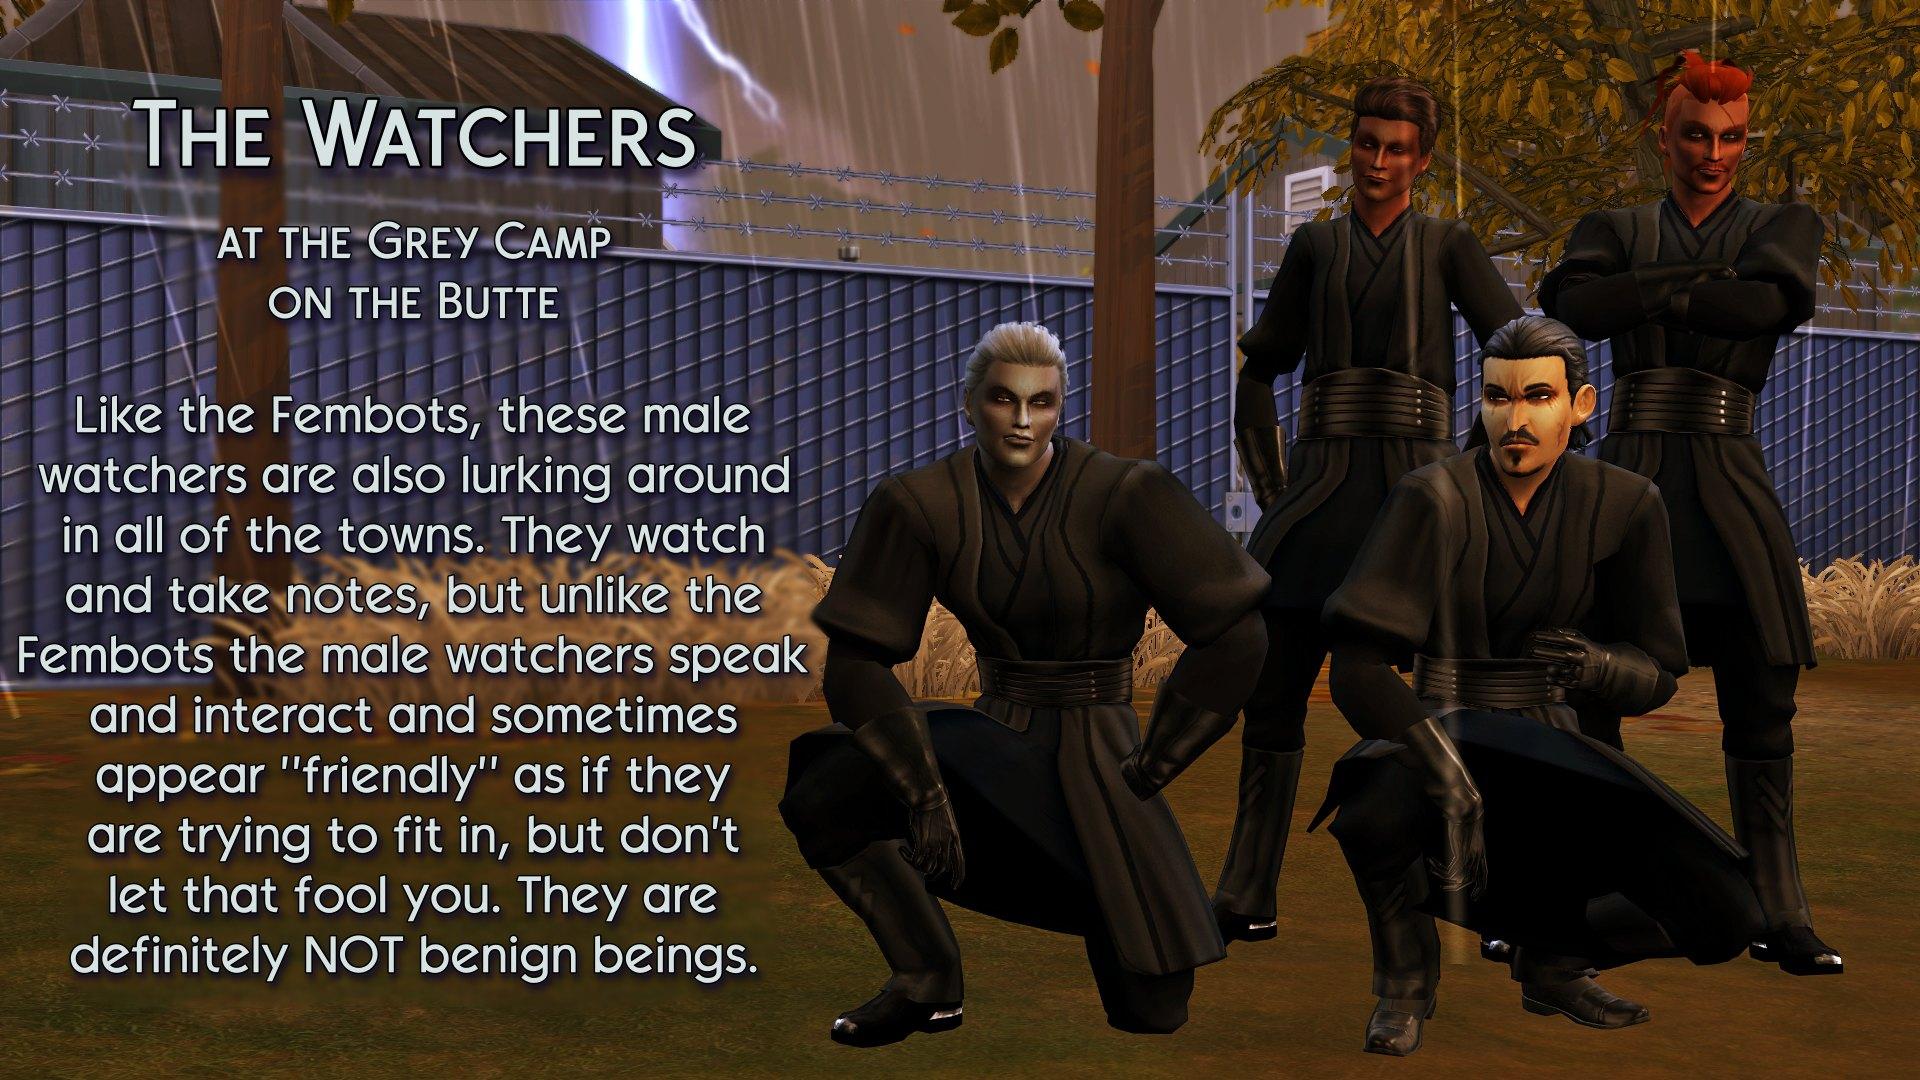 14 The Watchers